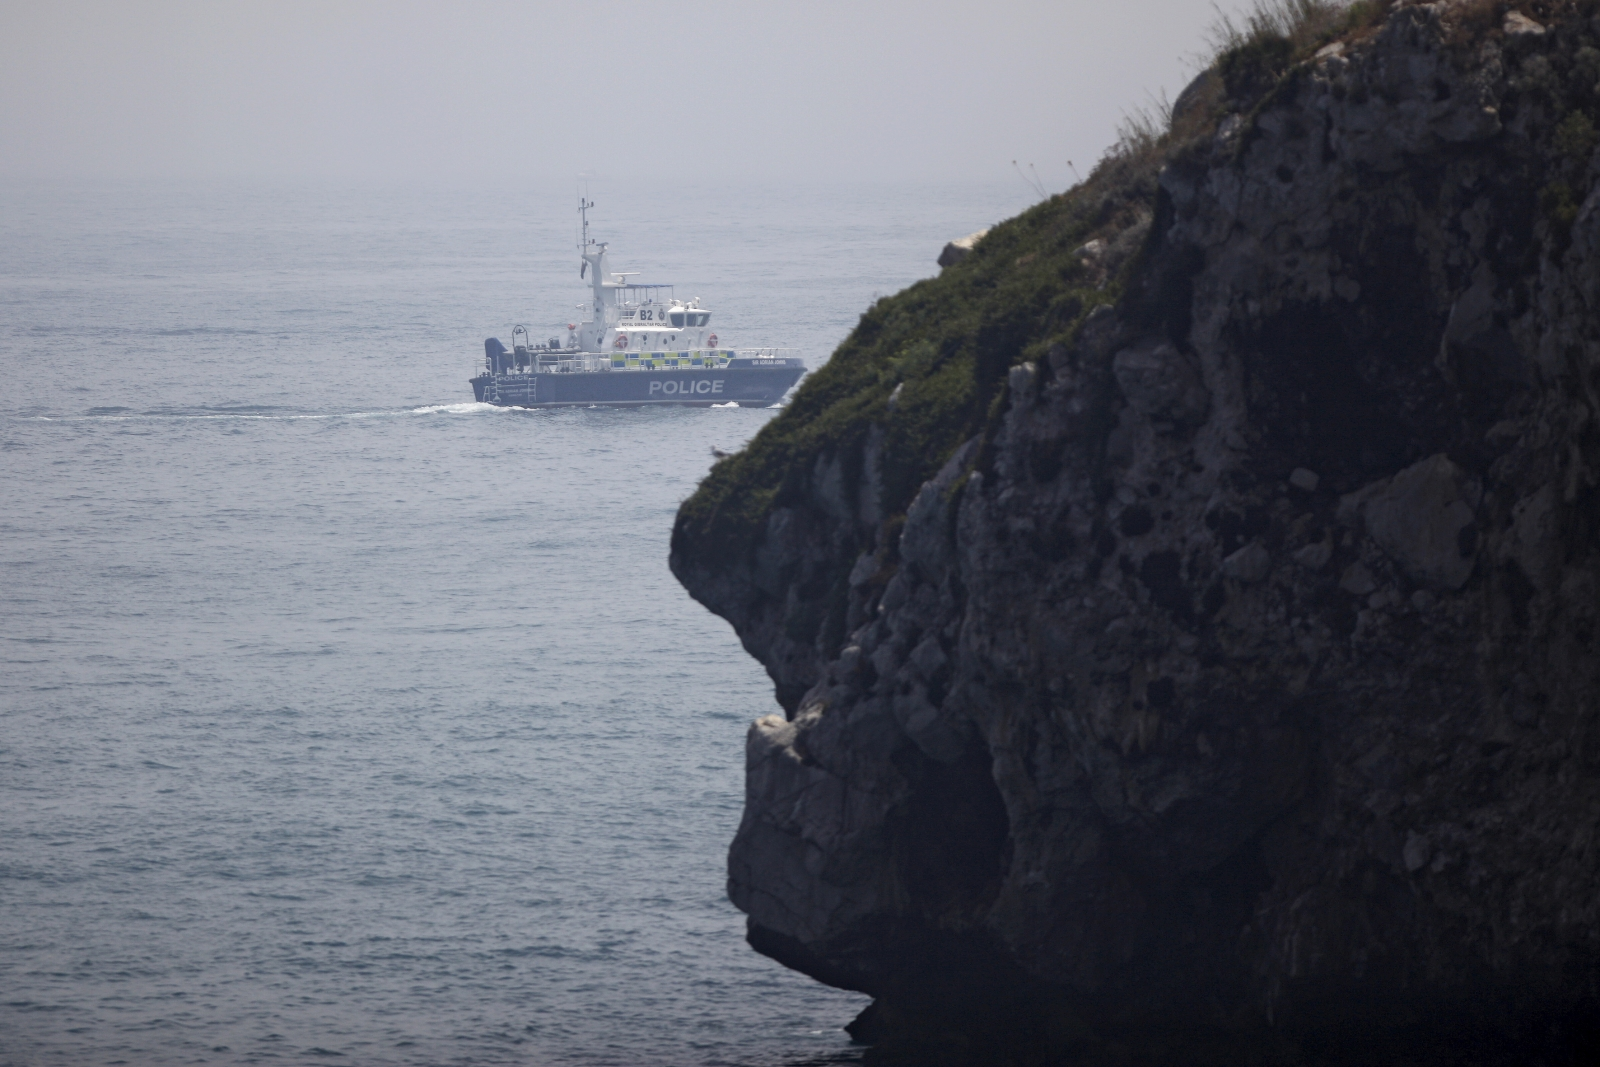 Gibraltar waters dispute